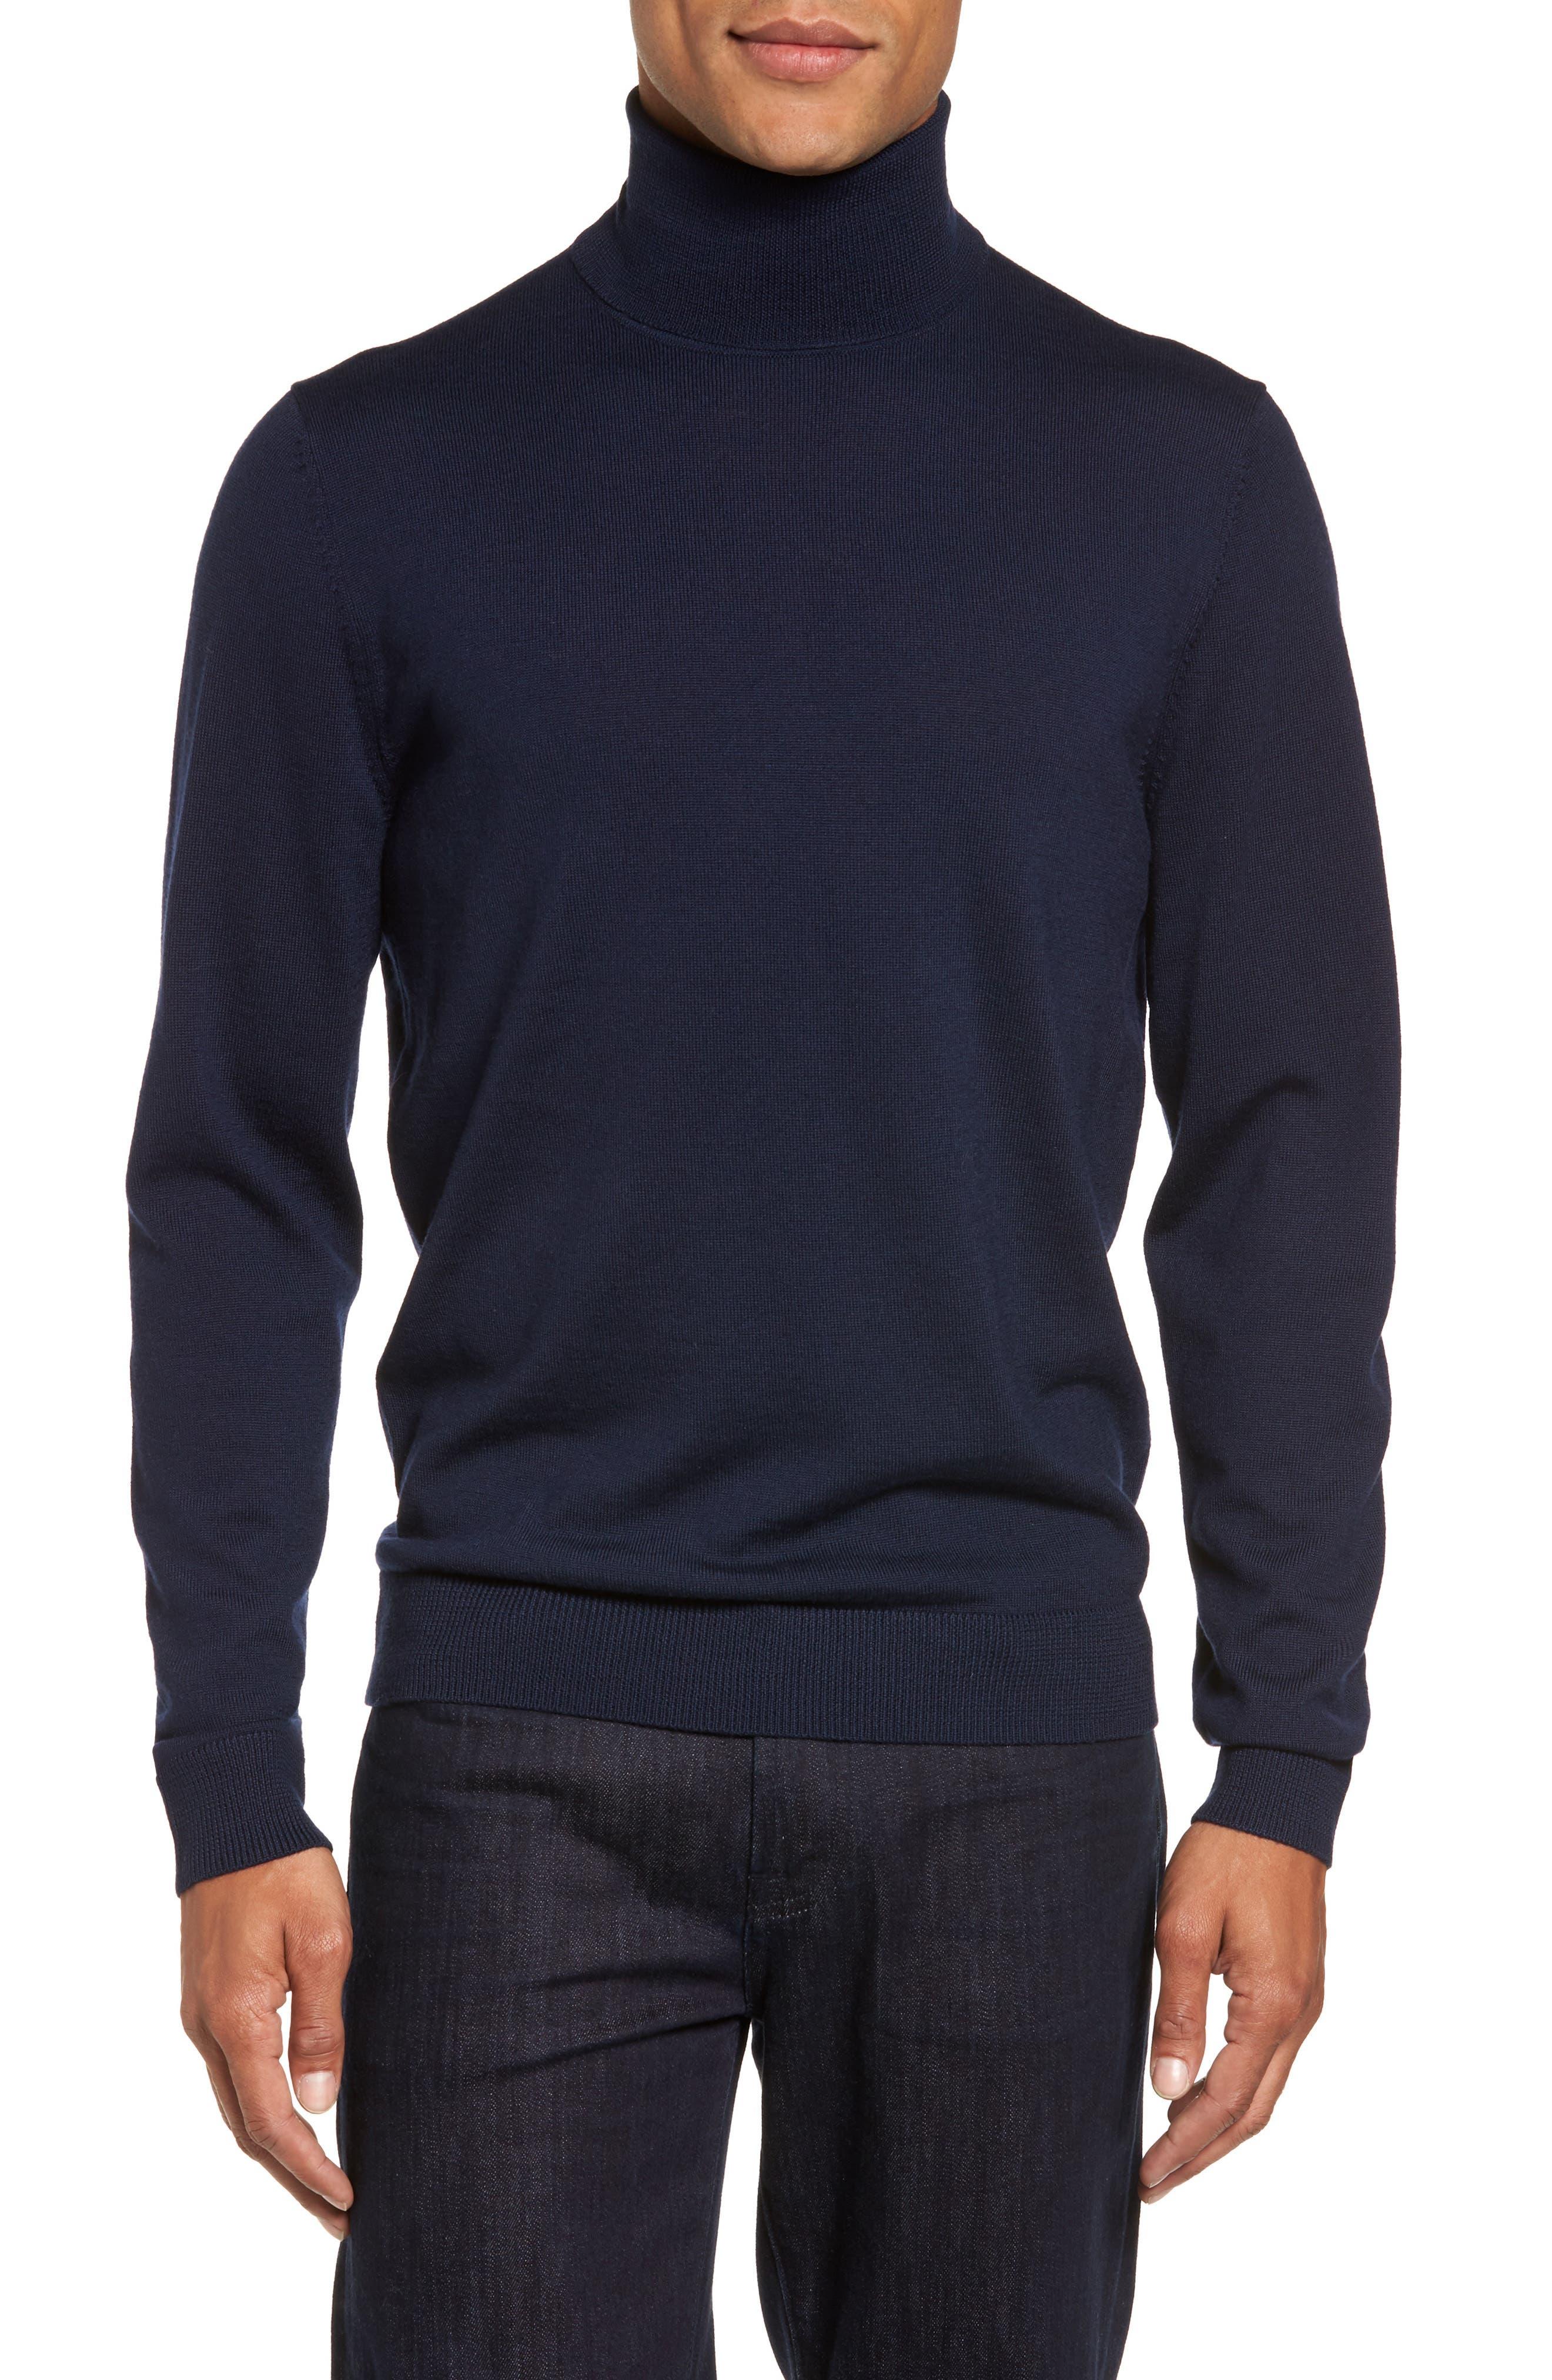 Nordstrom Shop Merino Wool Turtleneck Sweater, Blue